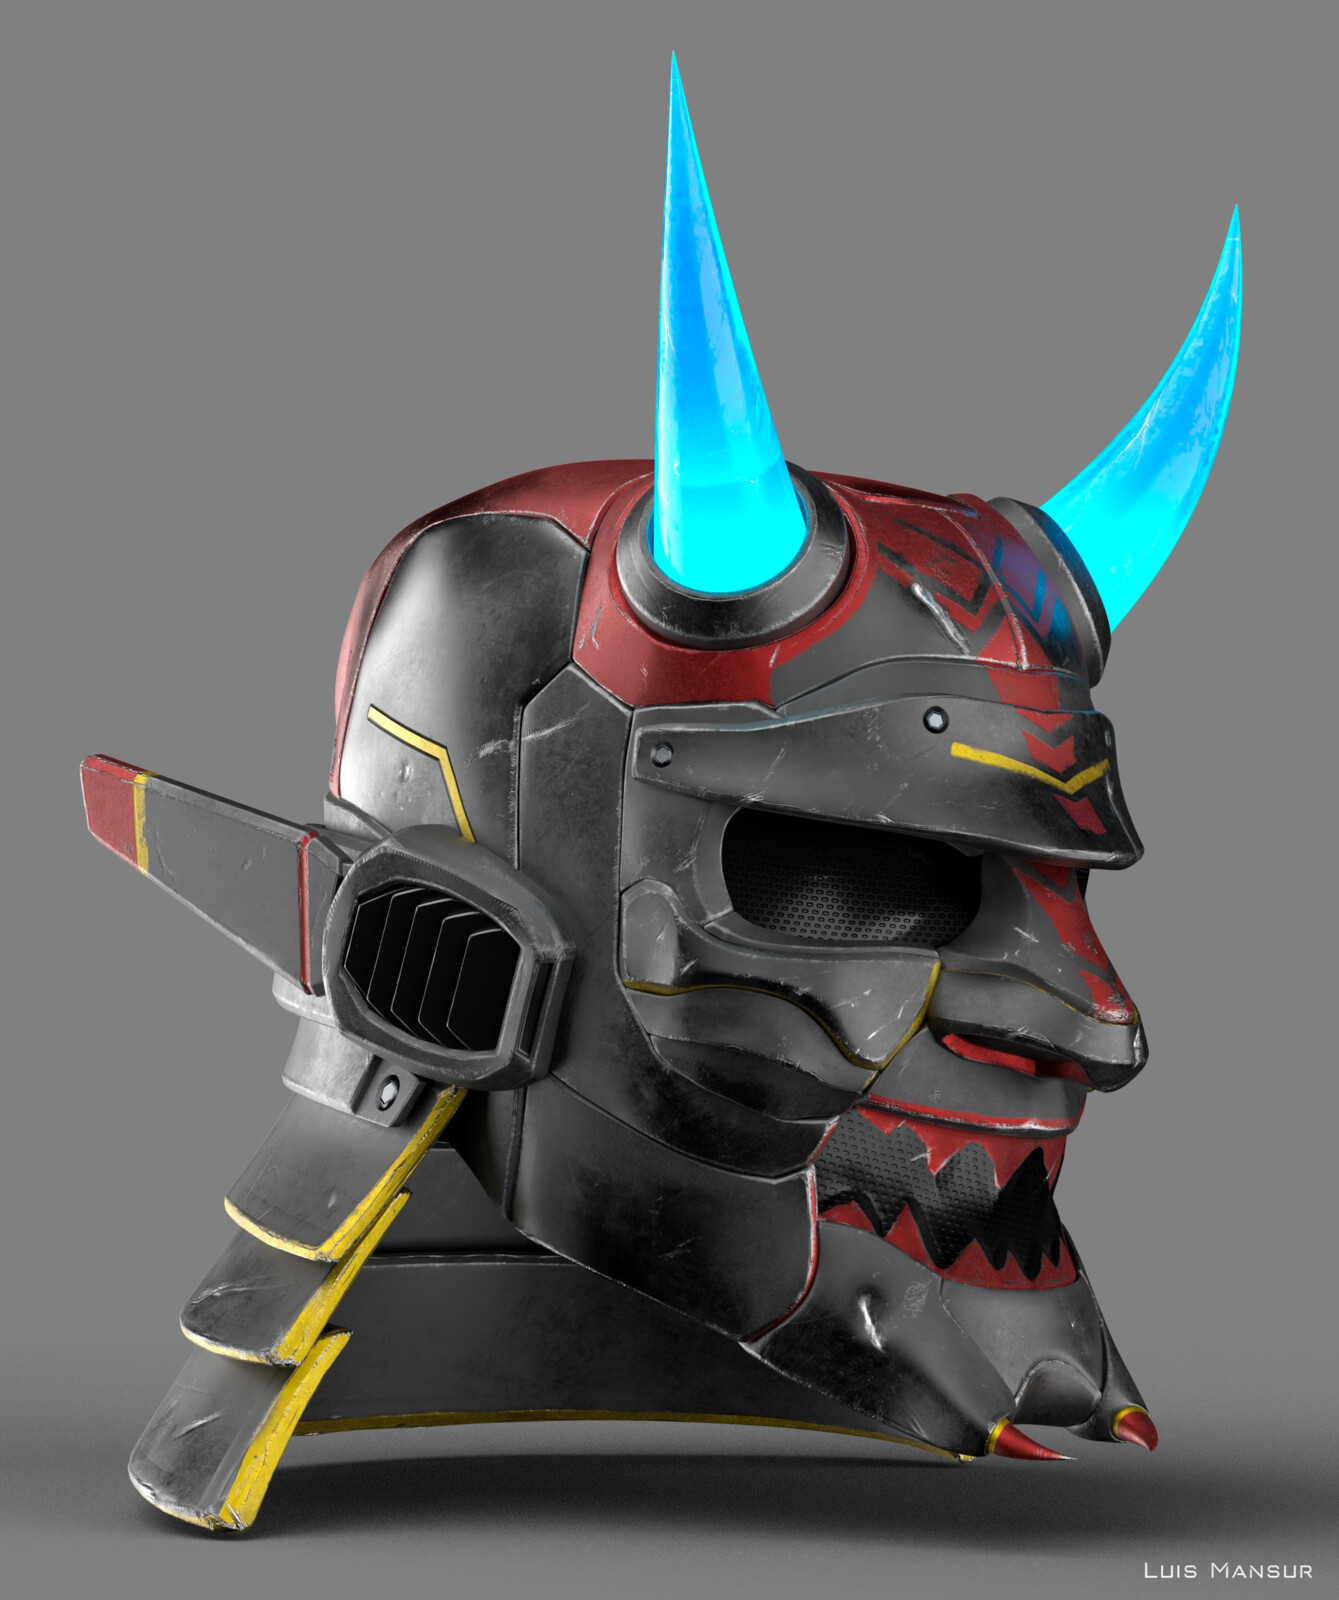 Sci-fi Samurai Helmet